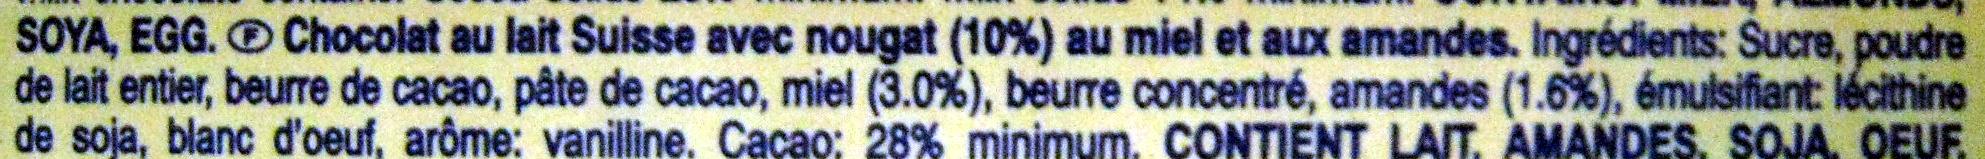 Toblerone (lot de 3 x 50 g) - Ingrediënten